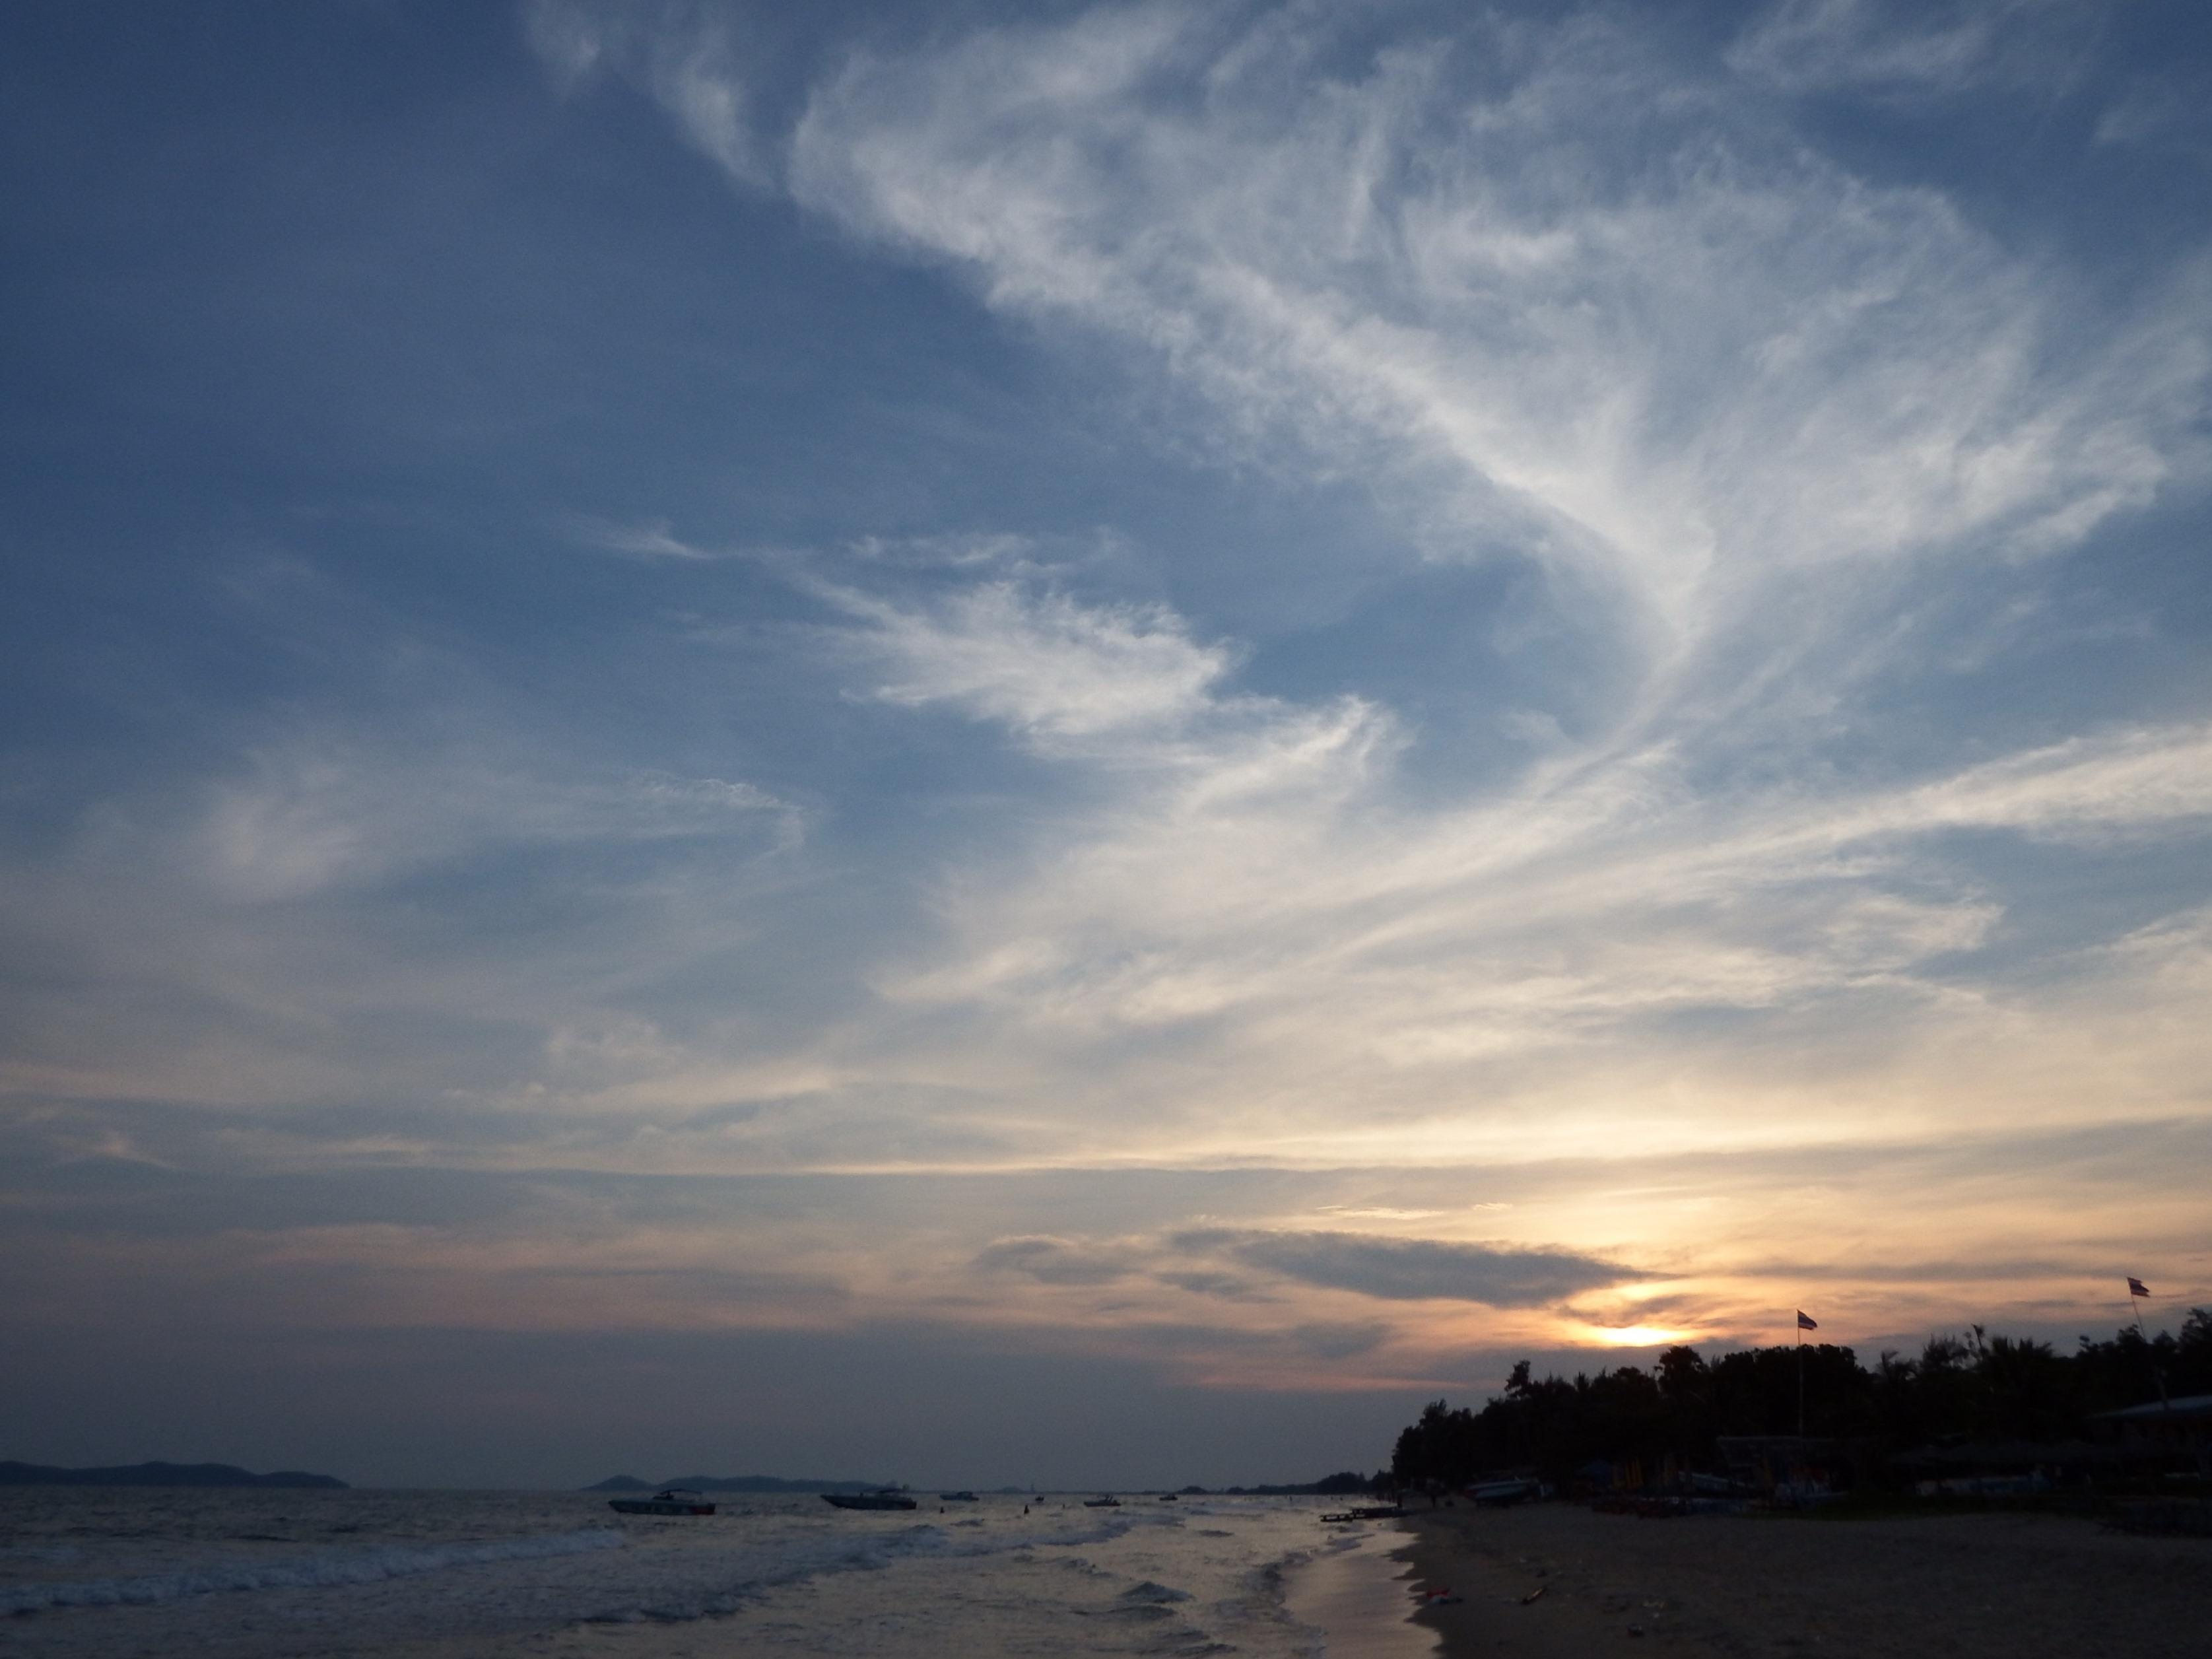 Sunset Sky, Beach, Sea, Tropical, Trees, HQ Photo